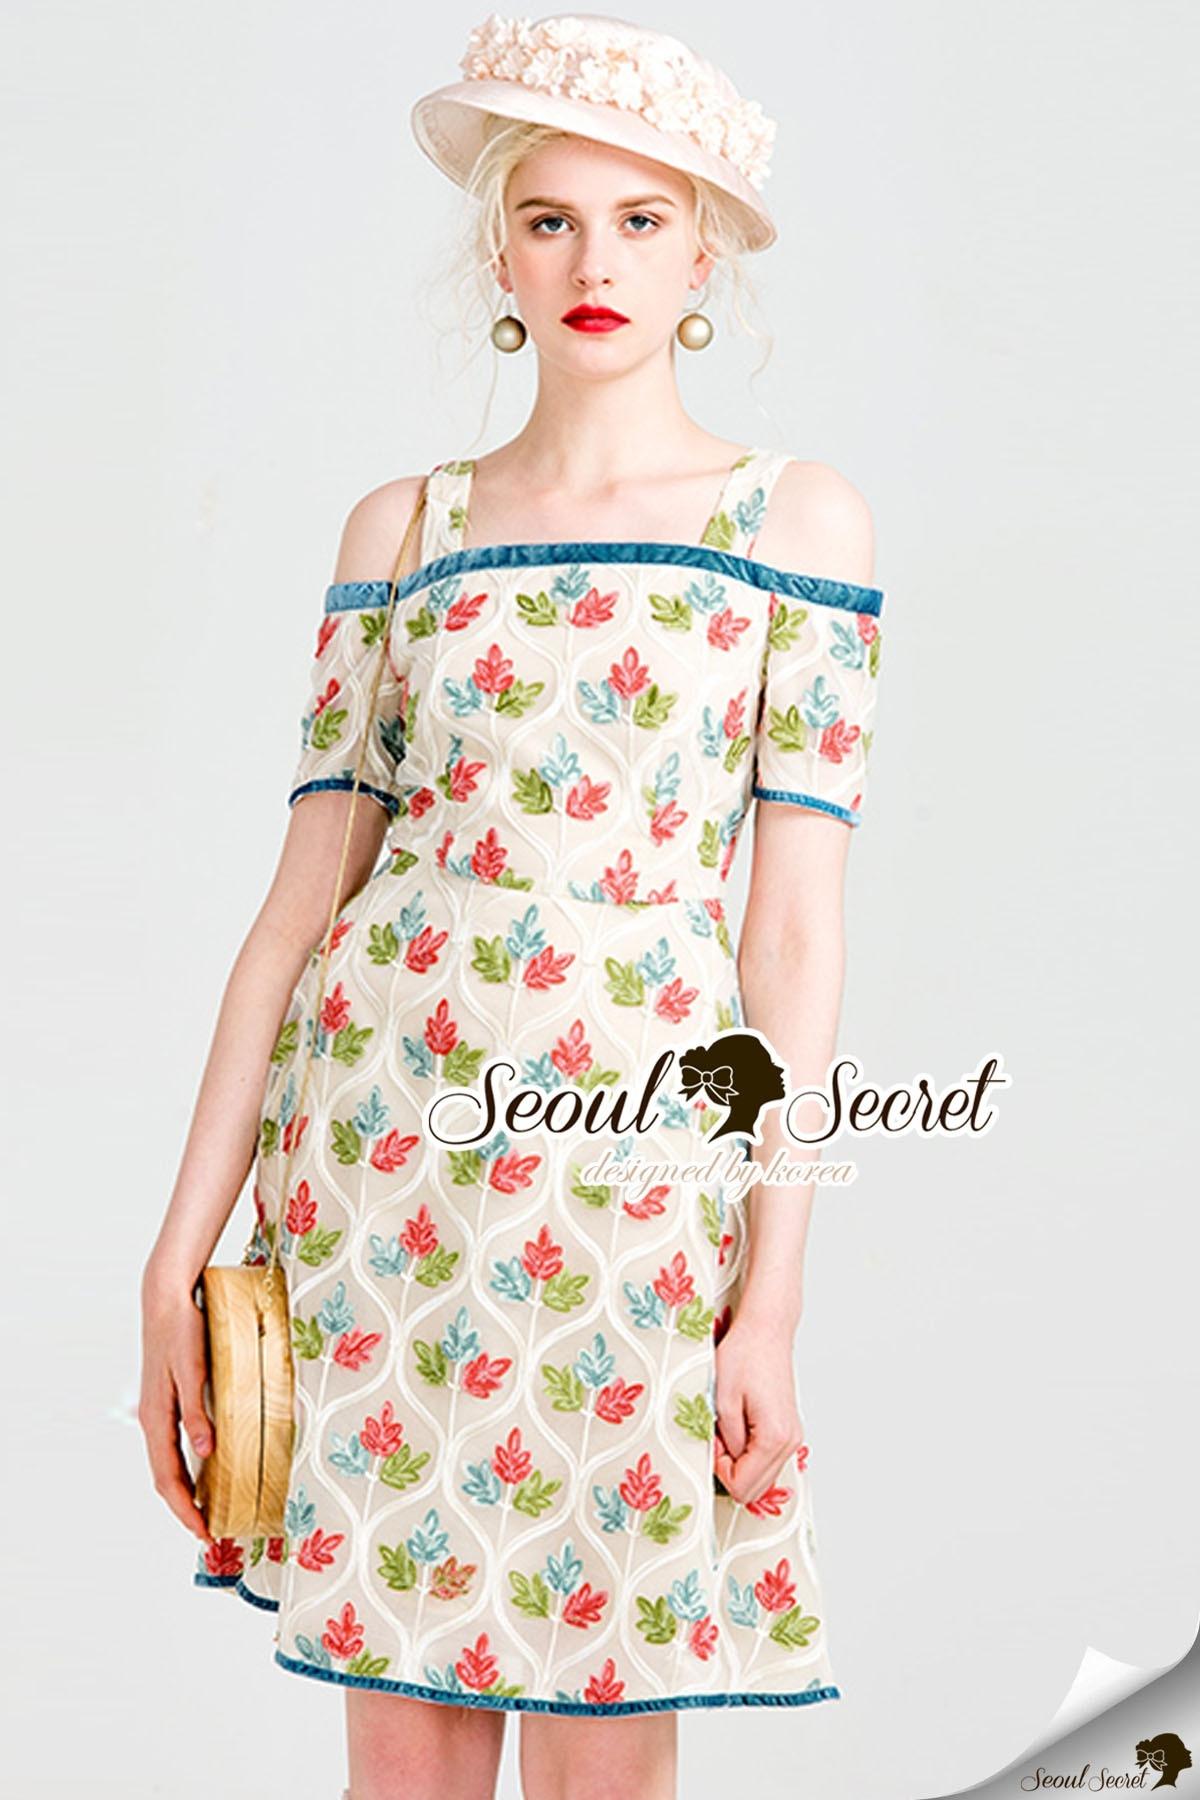 Seoul Secret Say's... Mixxy Color Leaf Sweety Netty Cream Dress